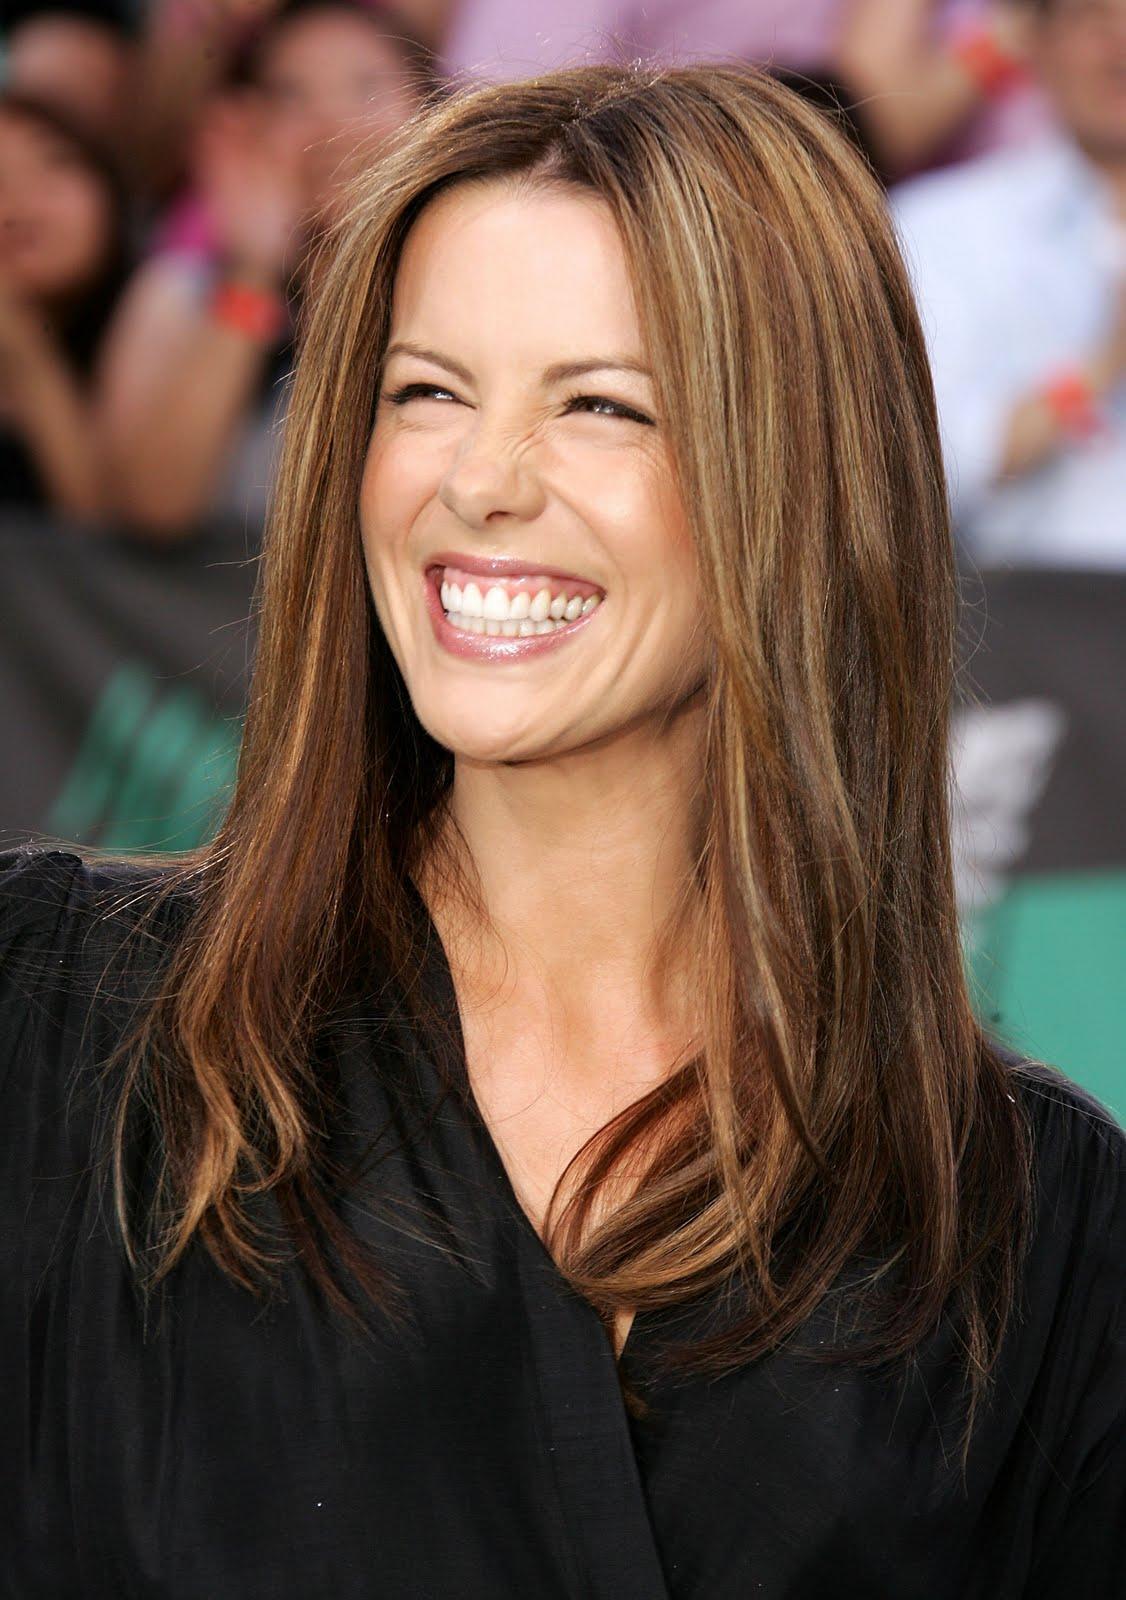 http://4.bp.blogspot.com/-5uy72DHifMU/TY4B8PbboQI/AAAAAAAABOw/JlIjYBKVeHM/s1600/91341_EK_Kate_Beckinsale_2006_MTV_Movie_Awards__Arrivals_0006.jpg